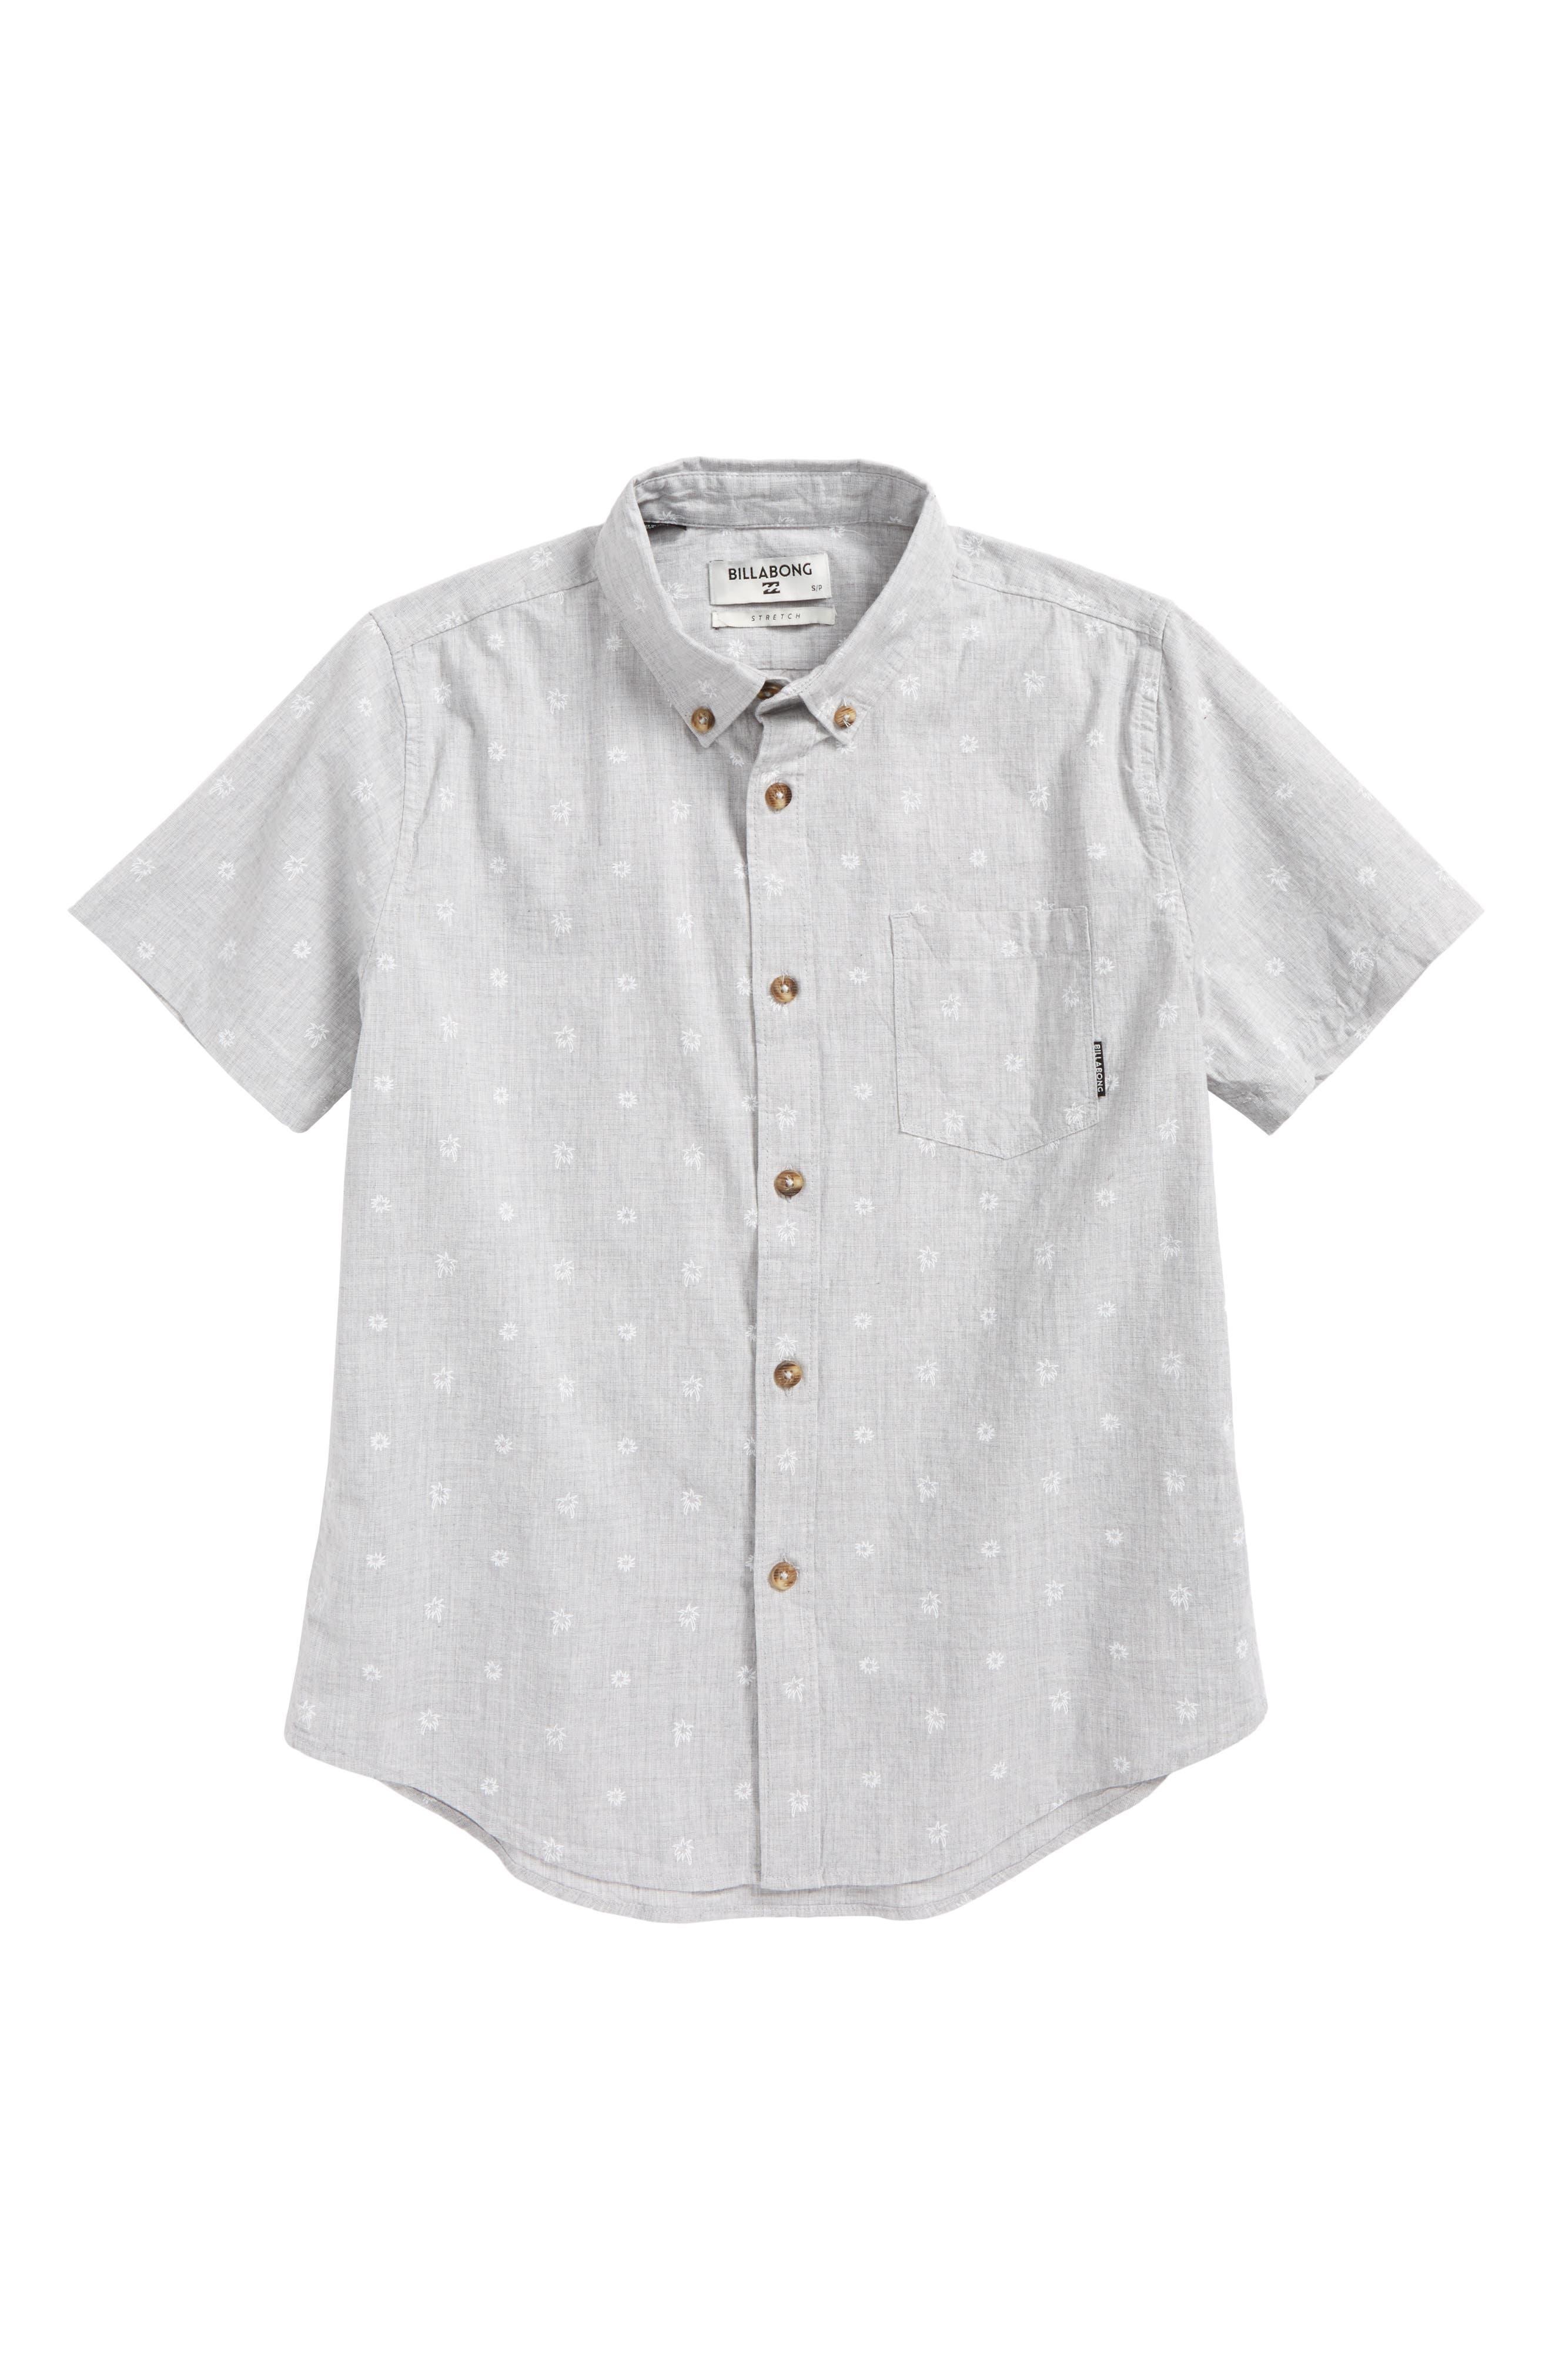 Sundays Mini Short Sleeve Woven Shirt,                         Main,                         color, Light Grey Heather